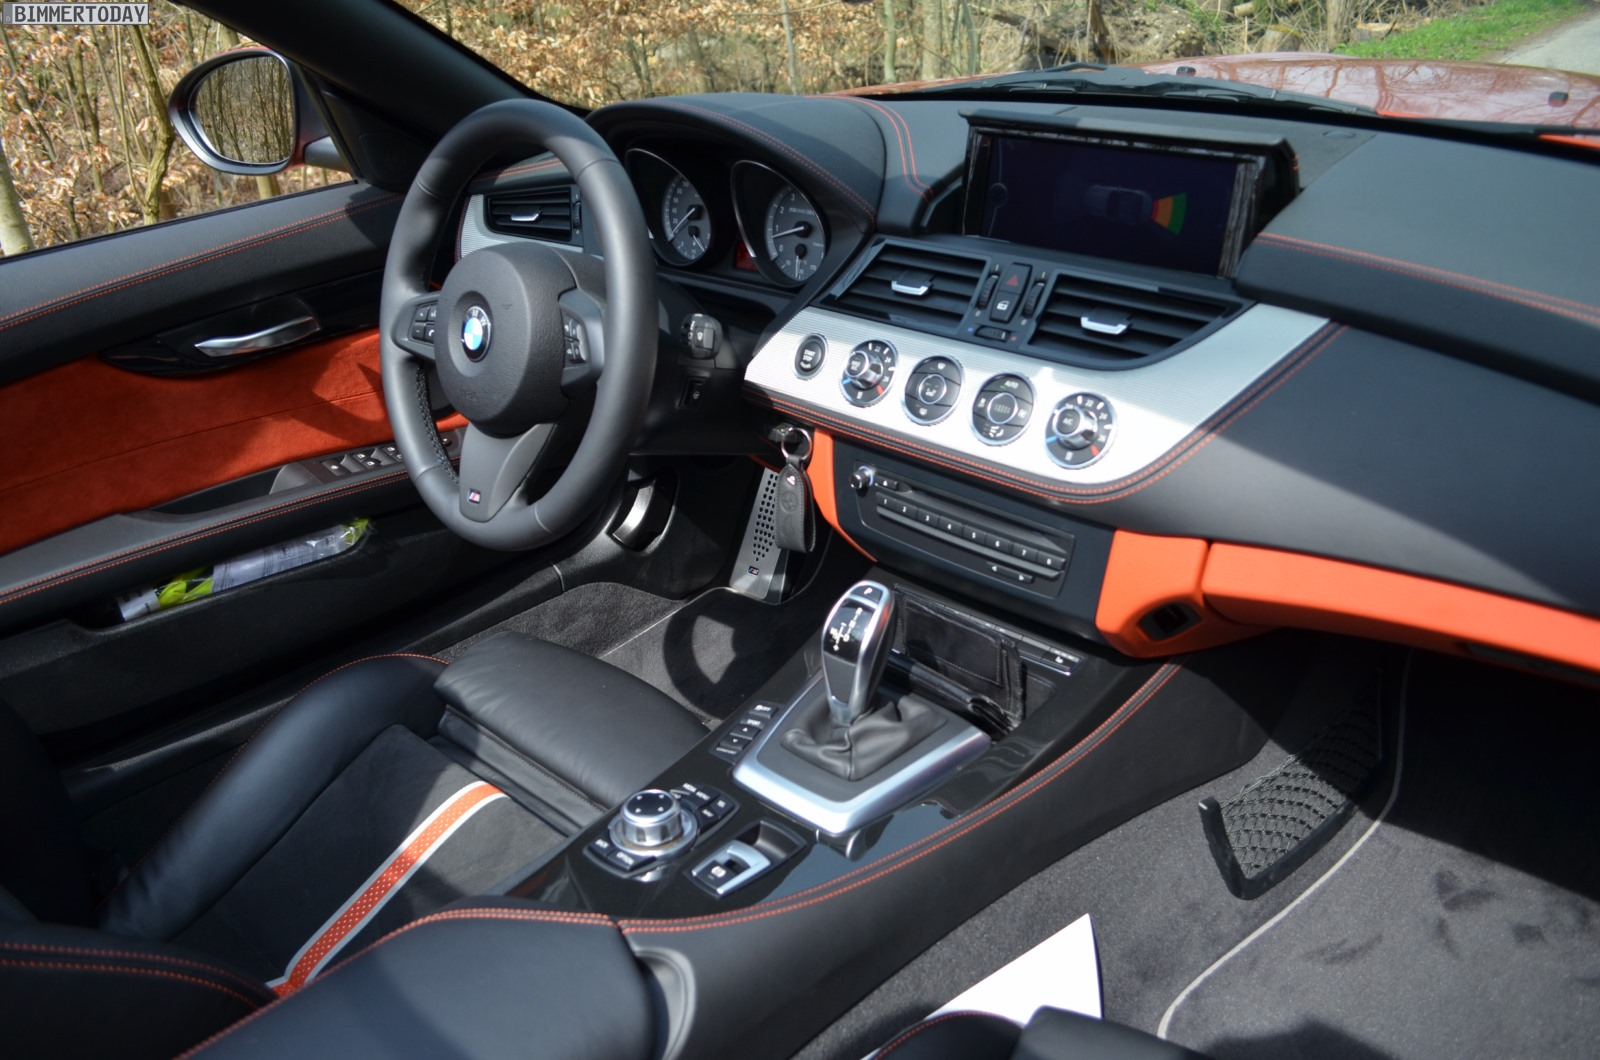 Fahrbericht Bmw Z4 Sdrive35is 2013 Roadster Mit Minimal Facelift